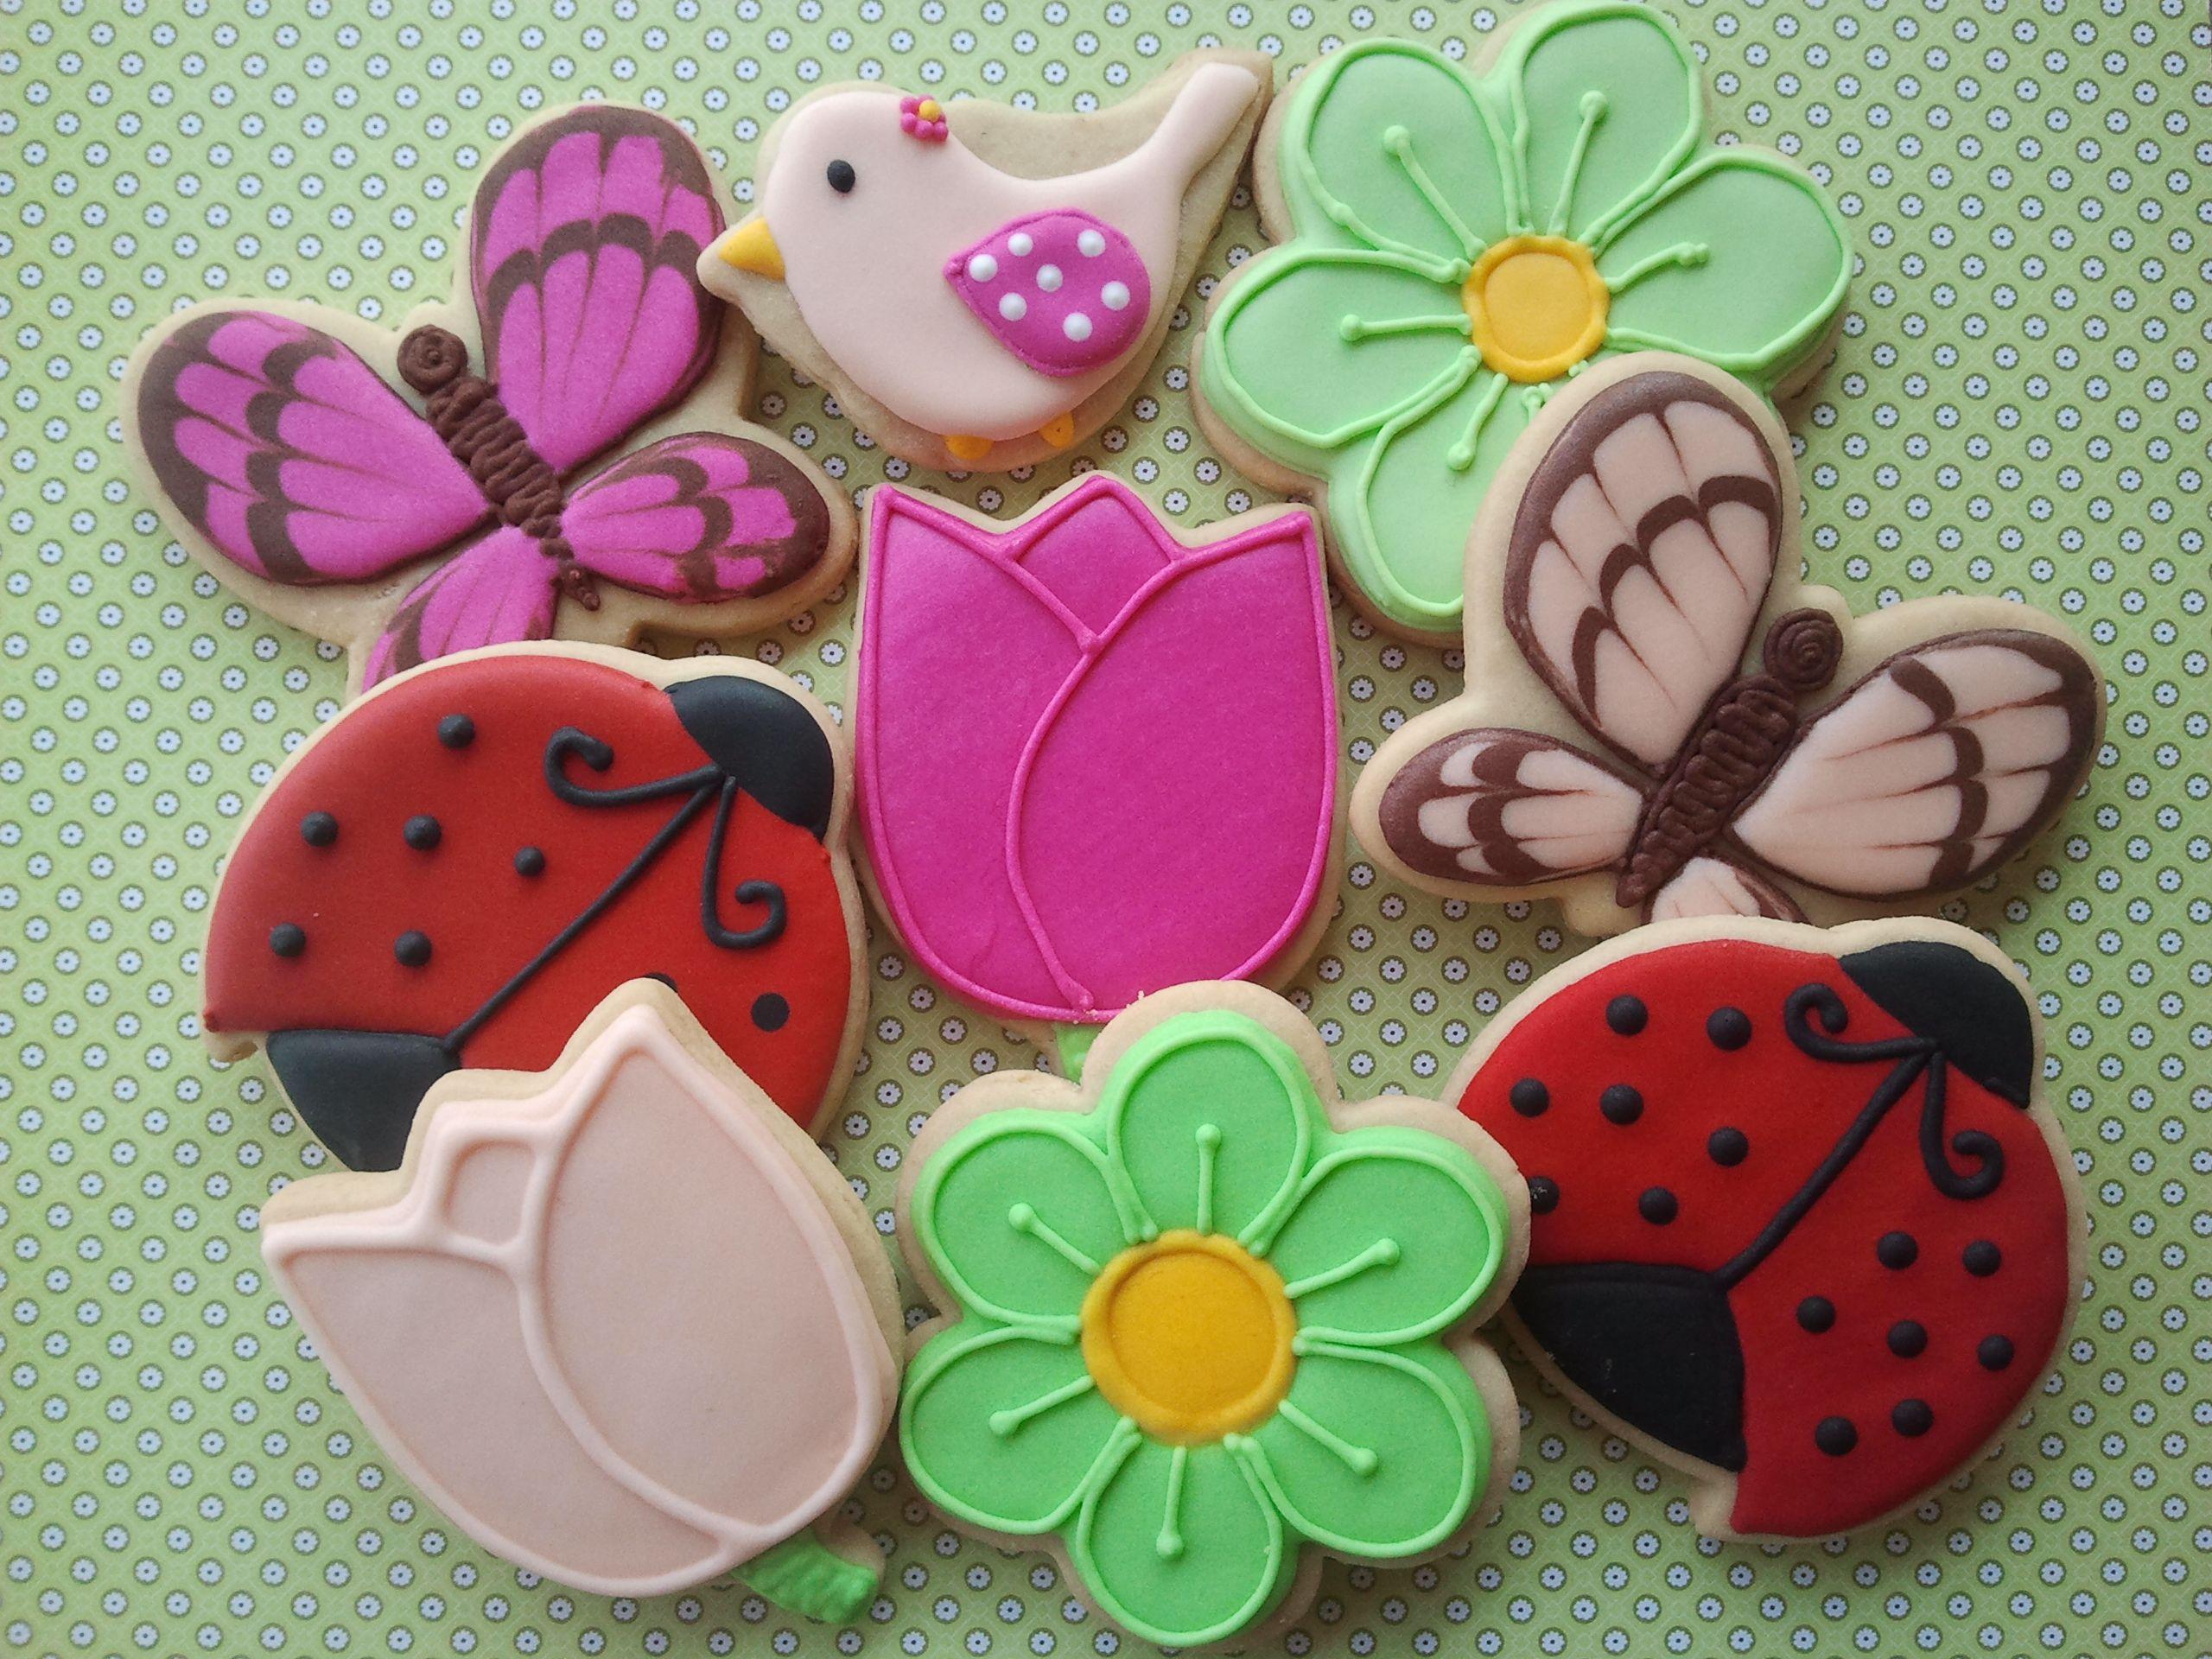 Primavera  Flores, P Ssaro, Borboleta, Joaninha  Cookies, Biscoitos